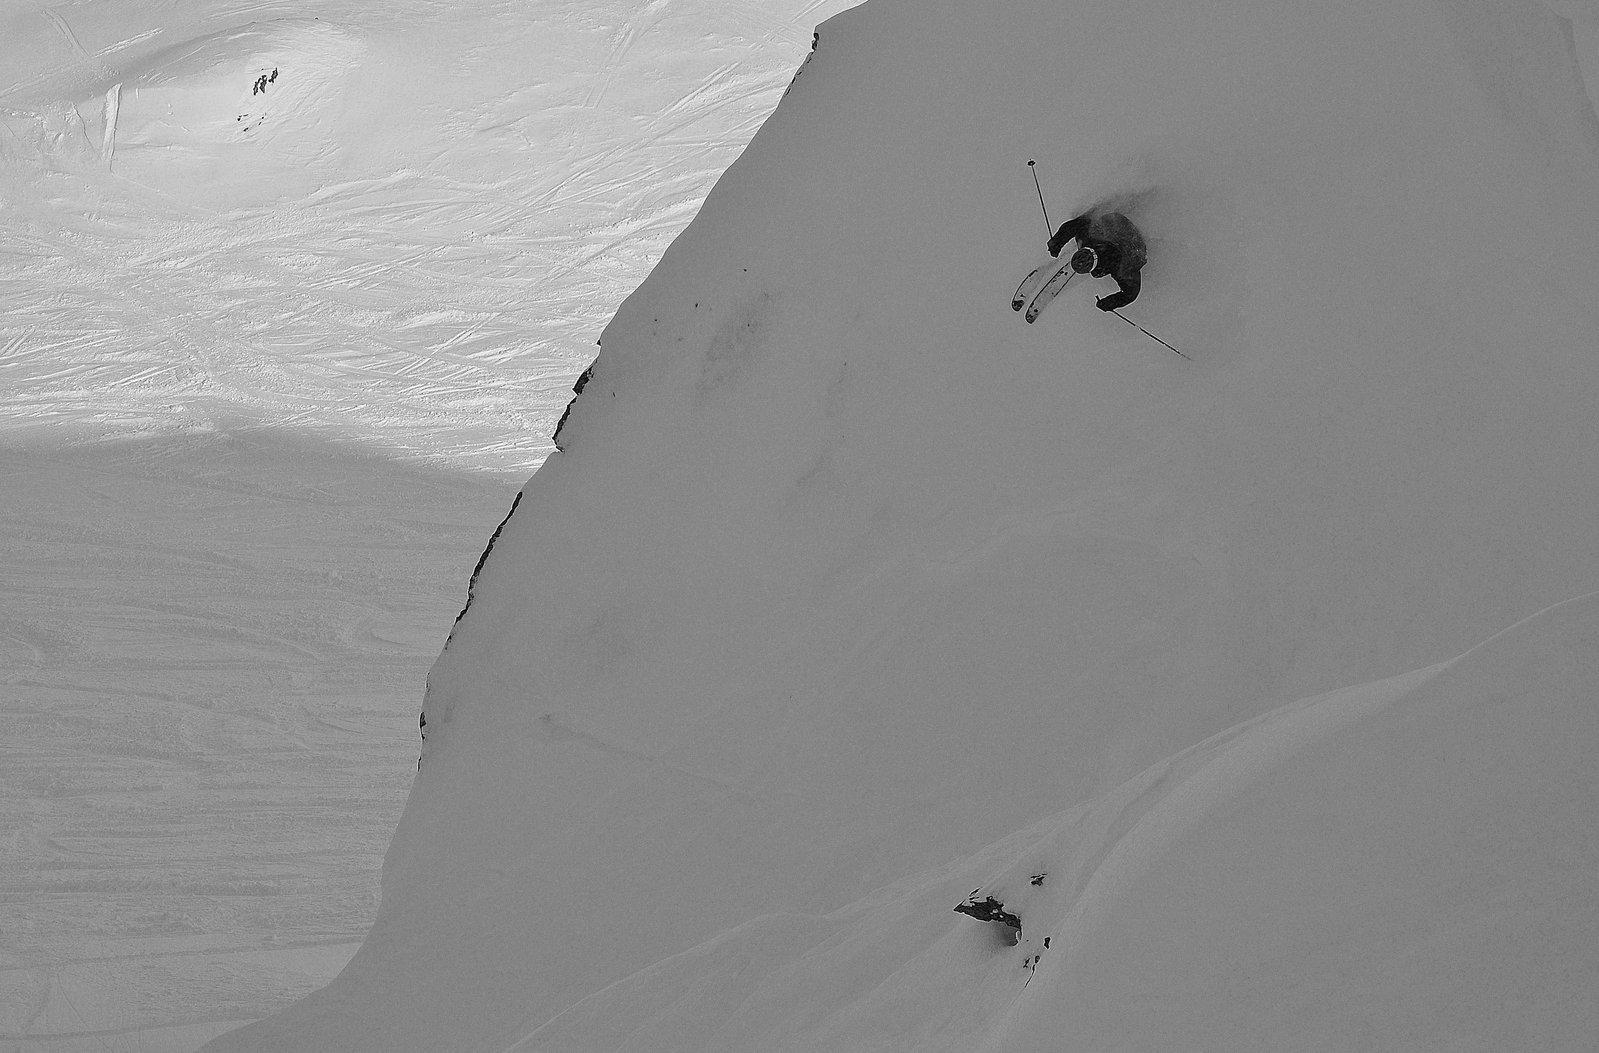 Escalator chute